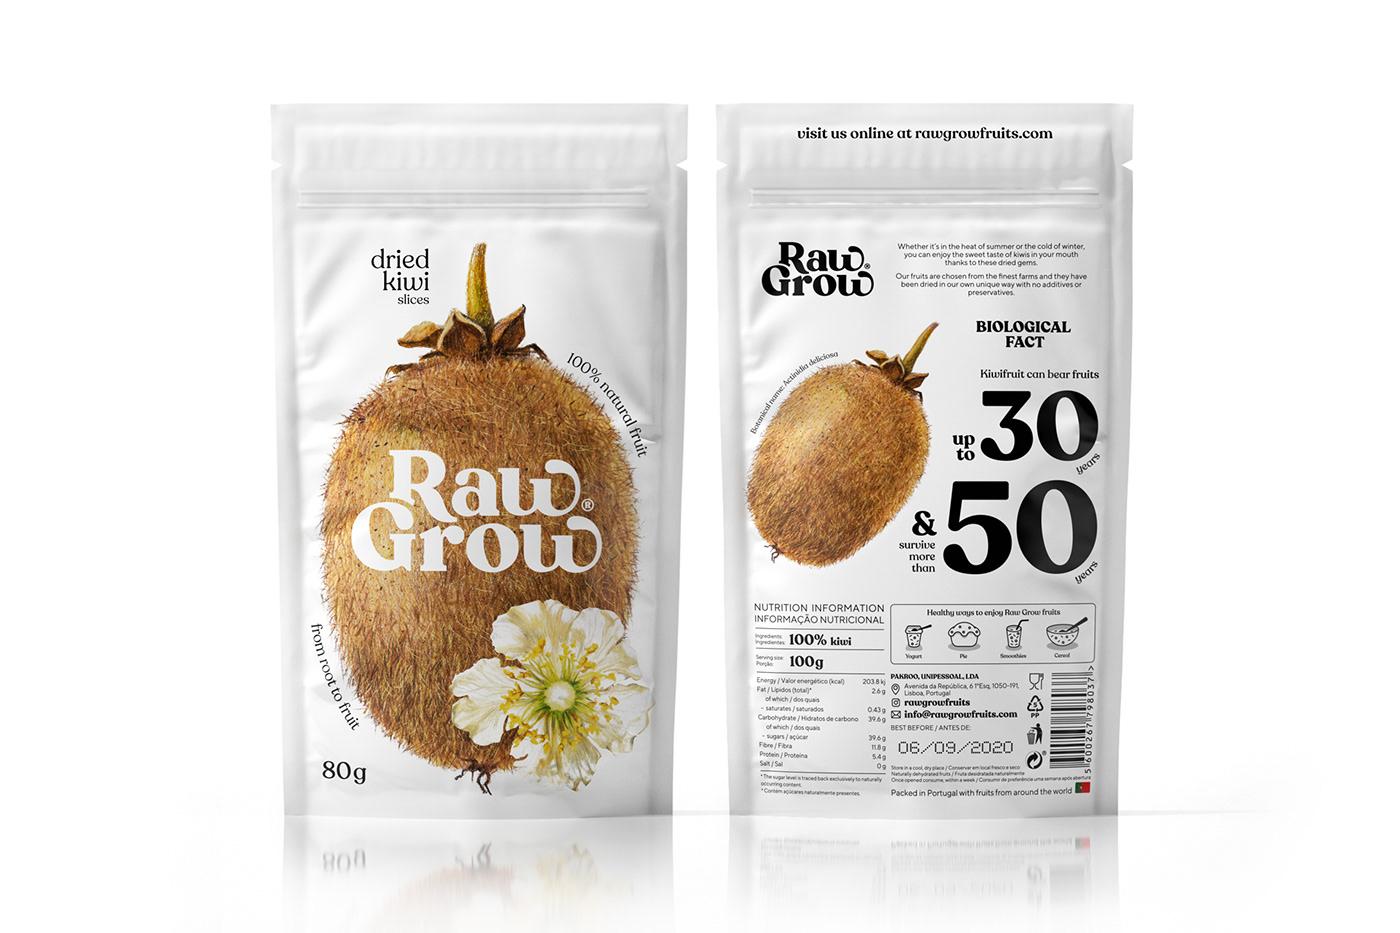 snacks graphic design  frutis drawings vegan Nature roots organic Flowers biology